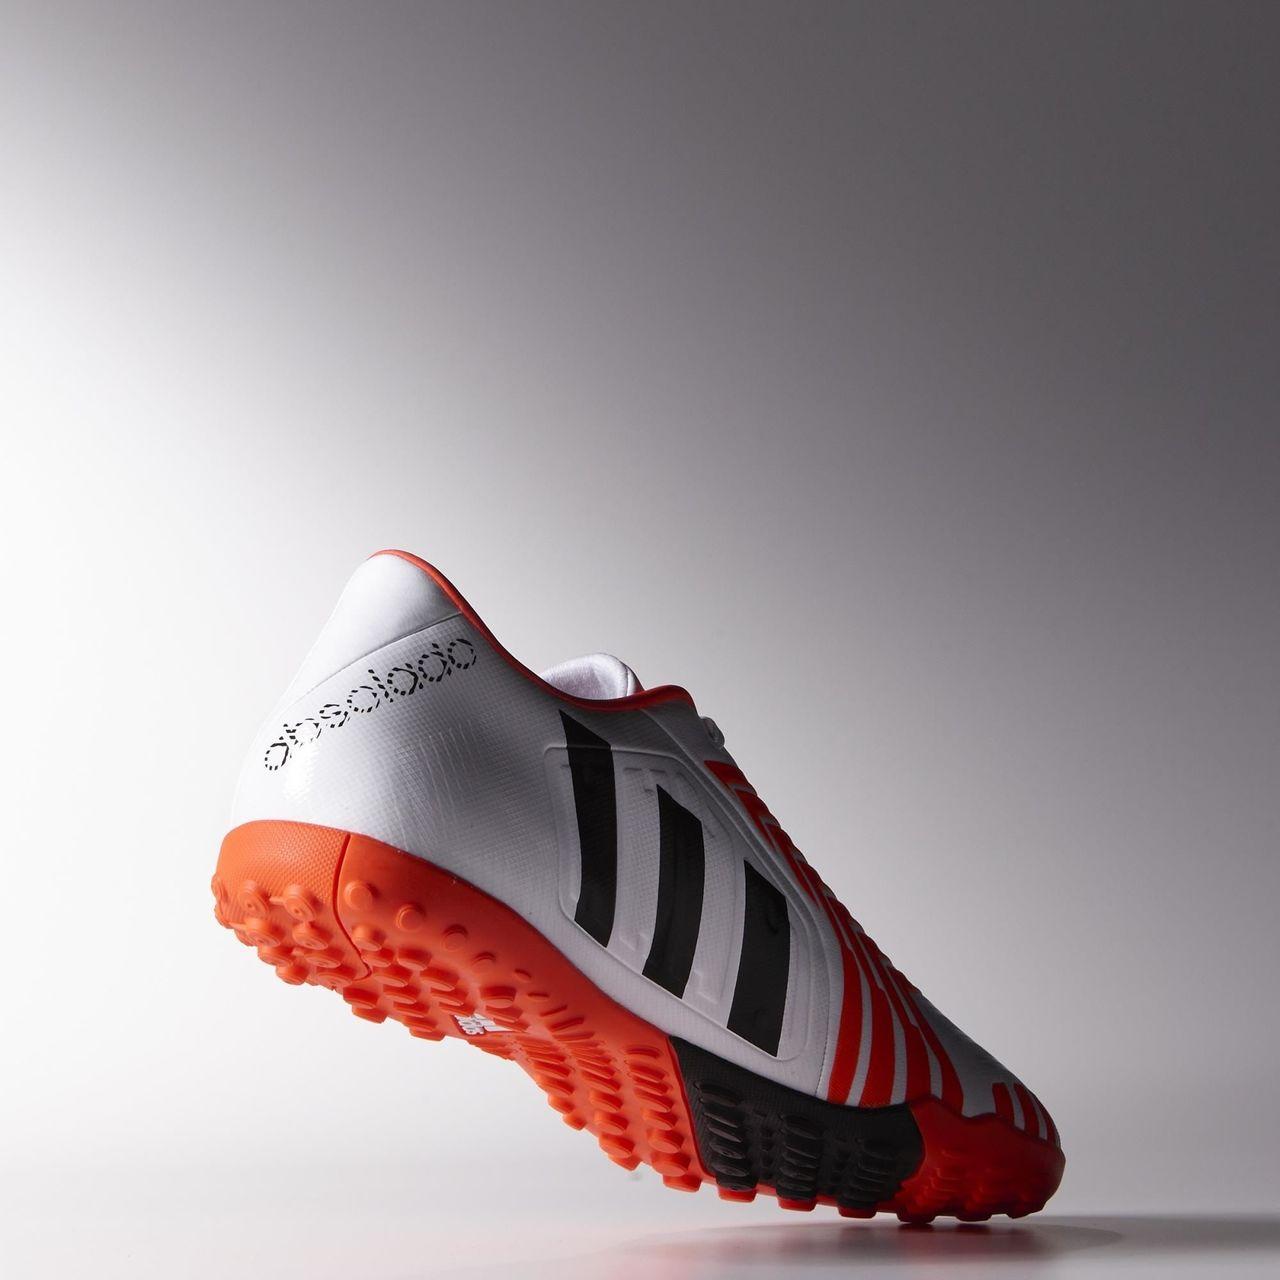 d86904cd19d1 ... Click to enlarge image adidas-predator-absolado-instinct-tf-shoes- ...